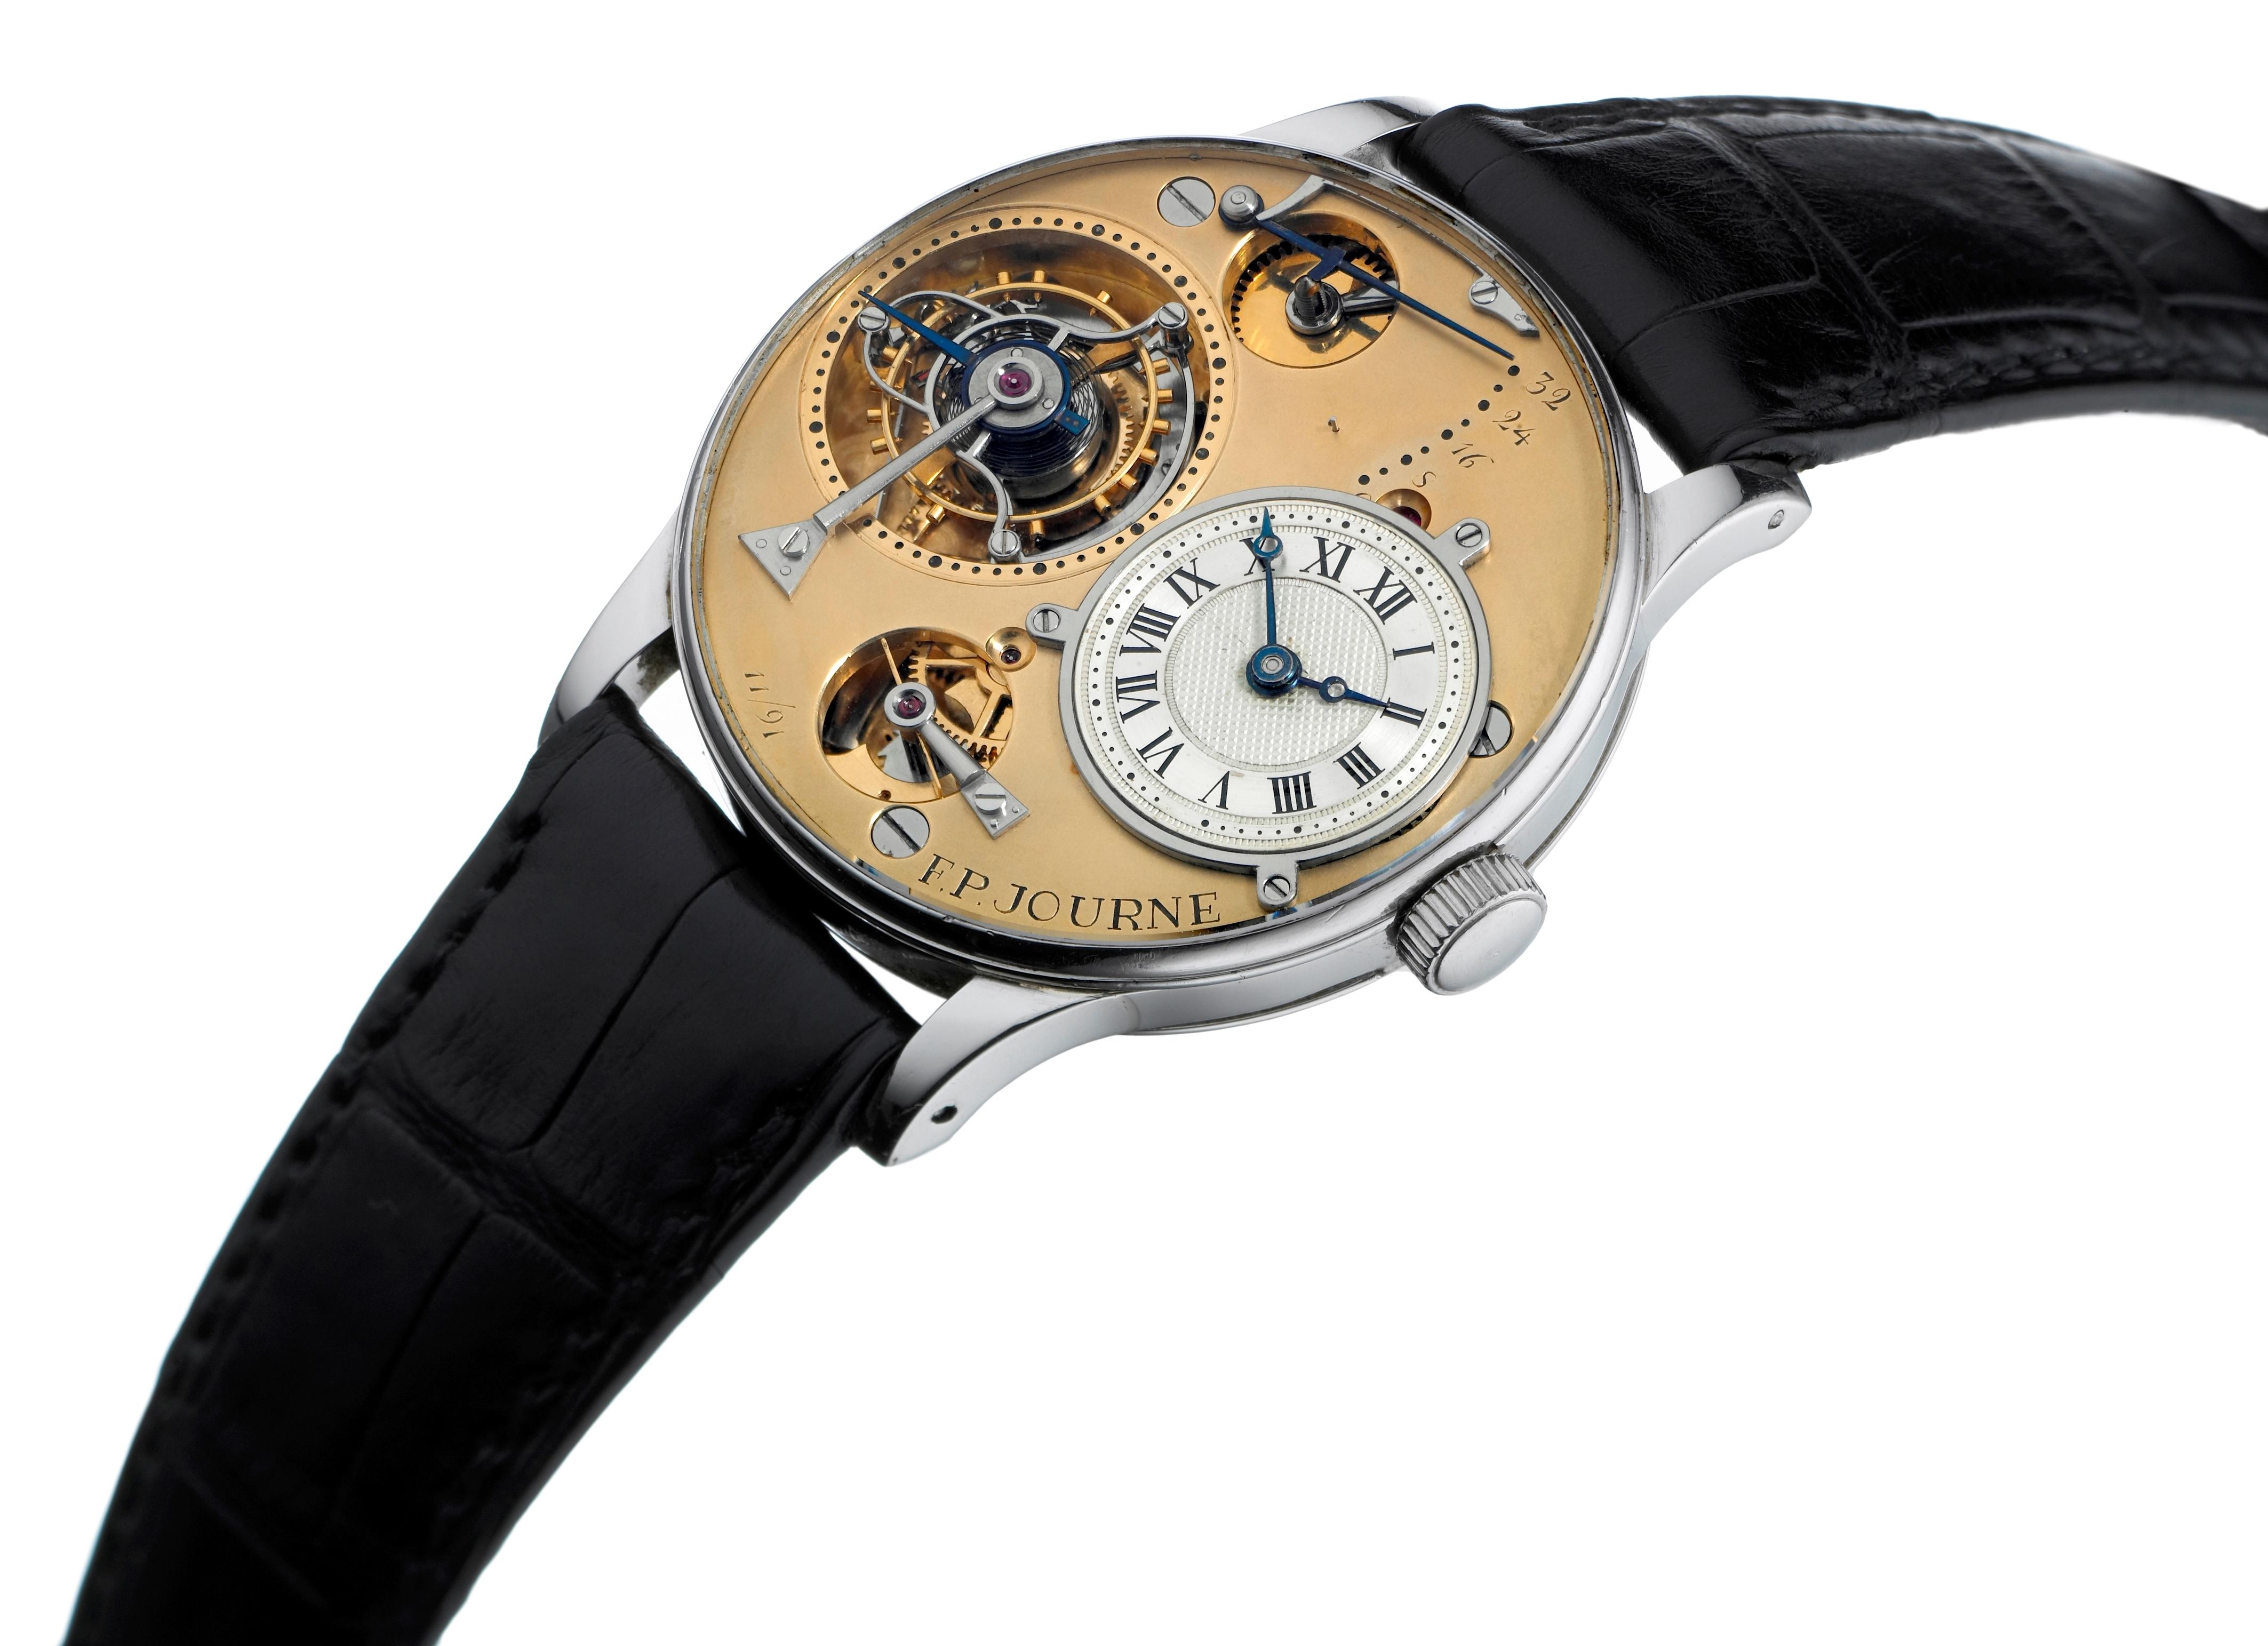 F. P. Journe's first tourbillon wristwatch